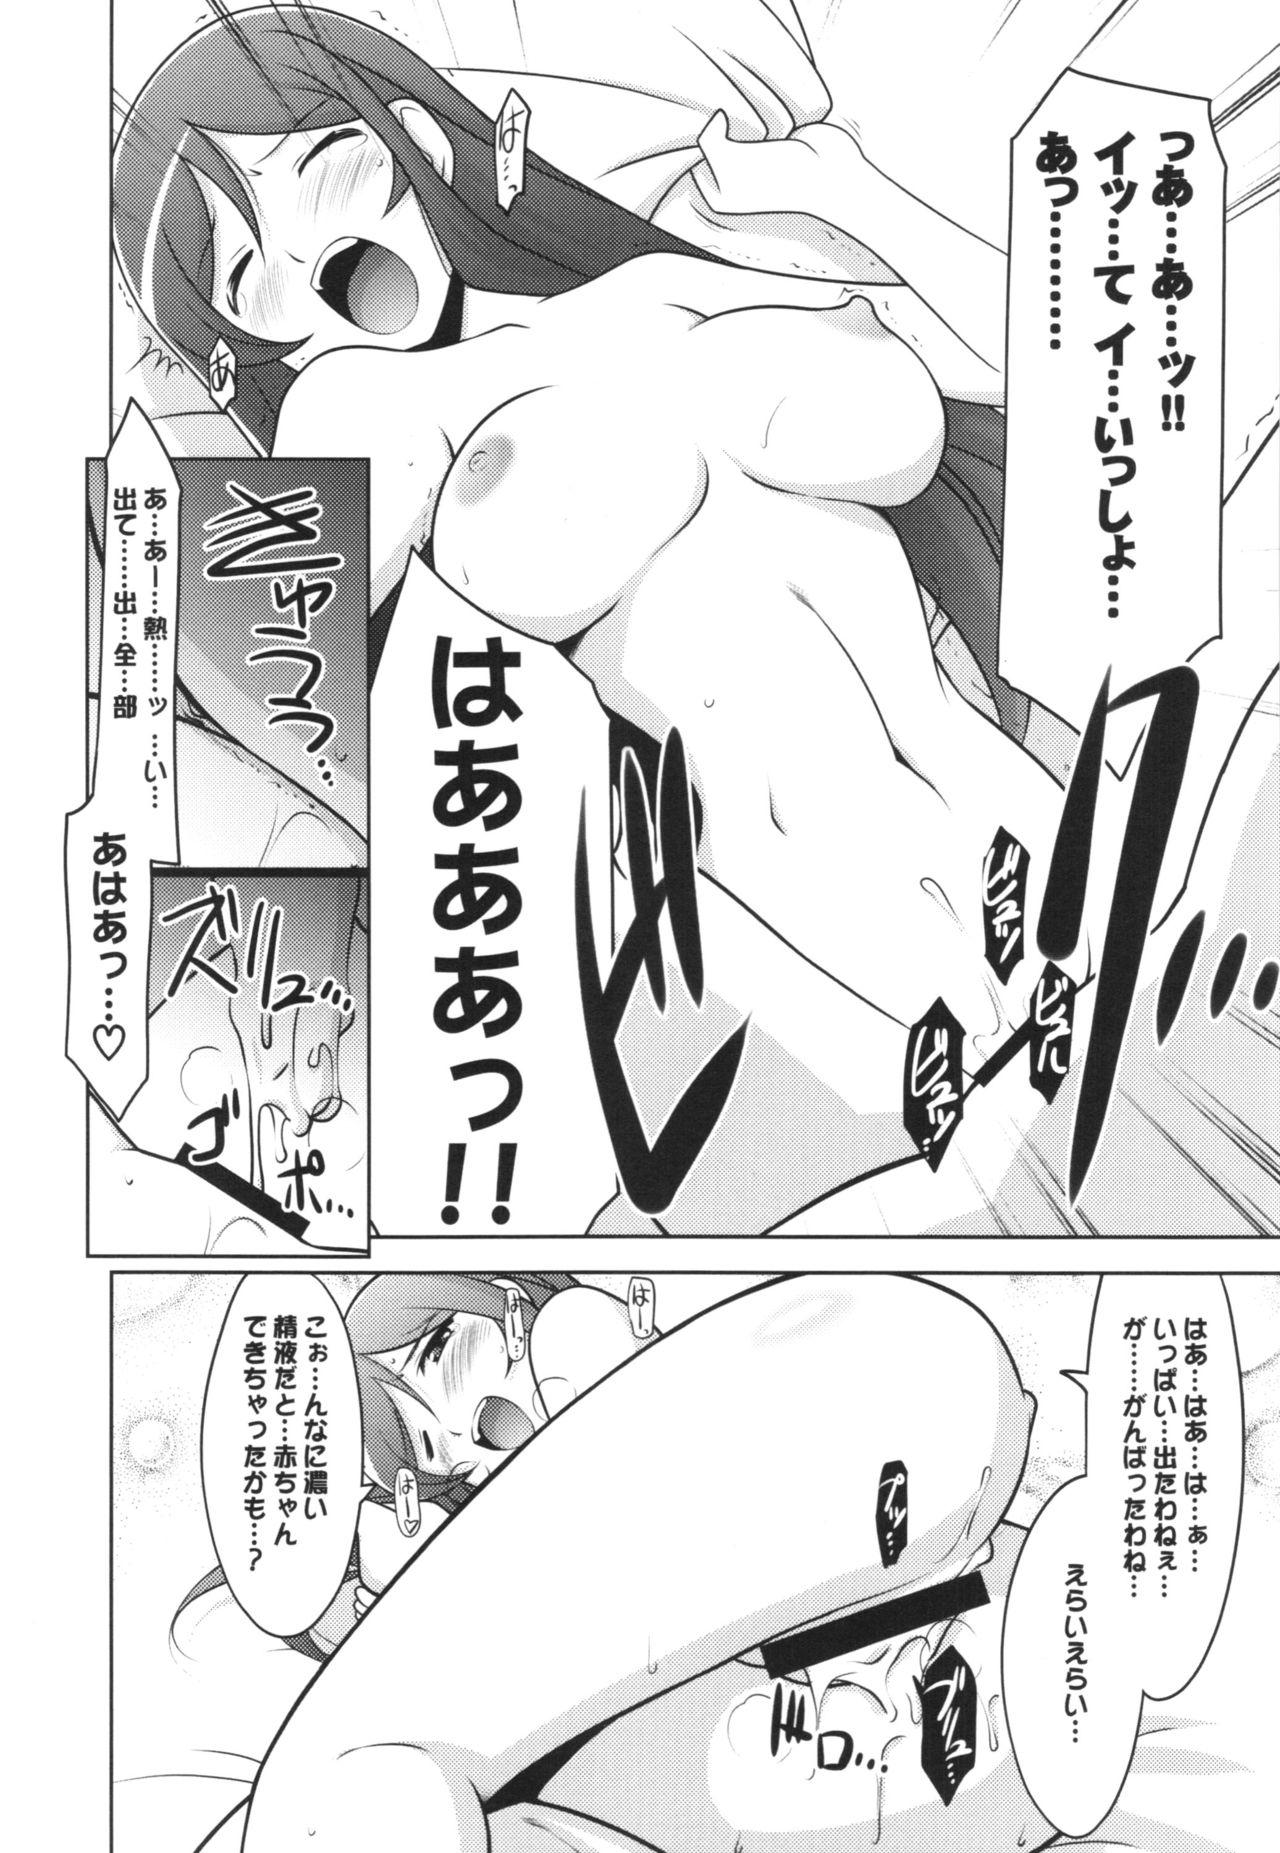 Ruridou Gahou CODE:54 + Kaijou Genteibon 4